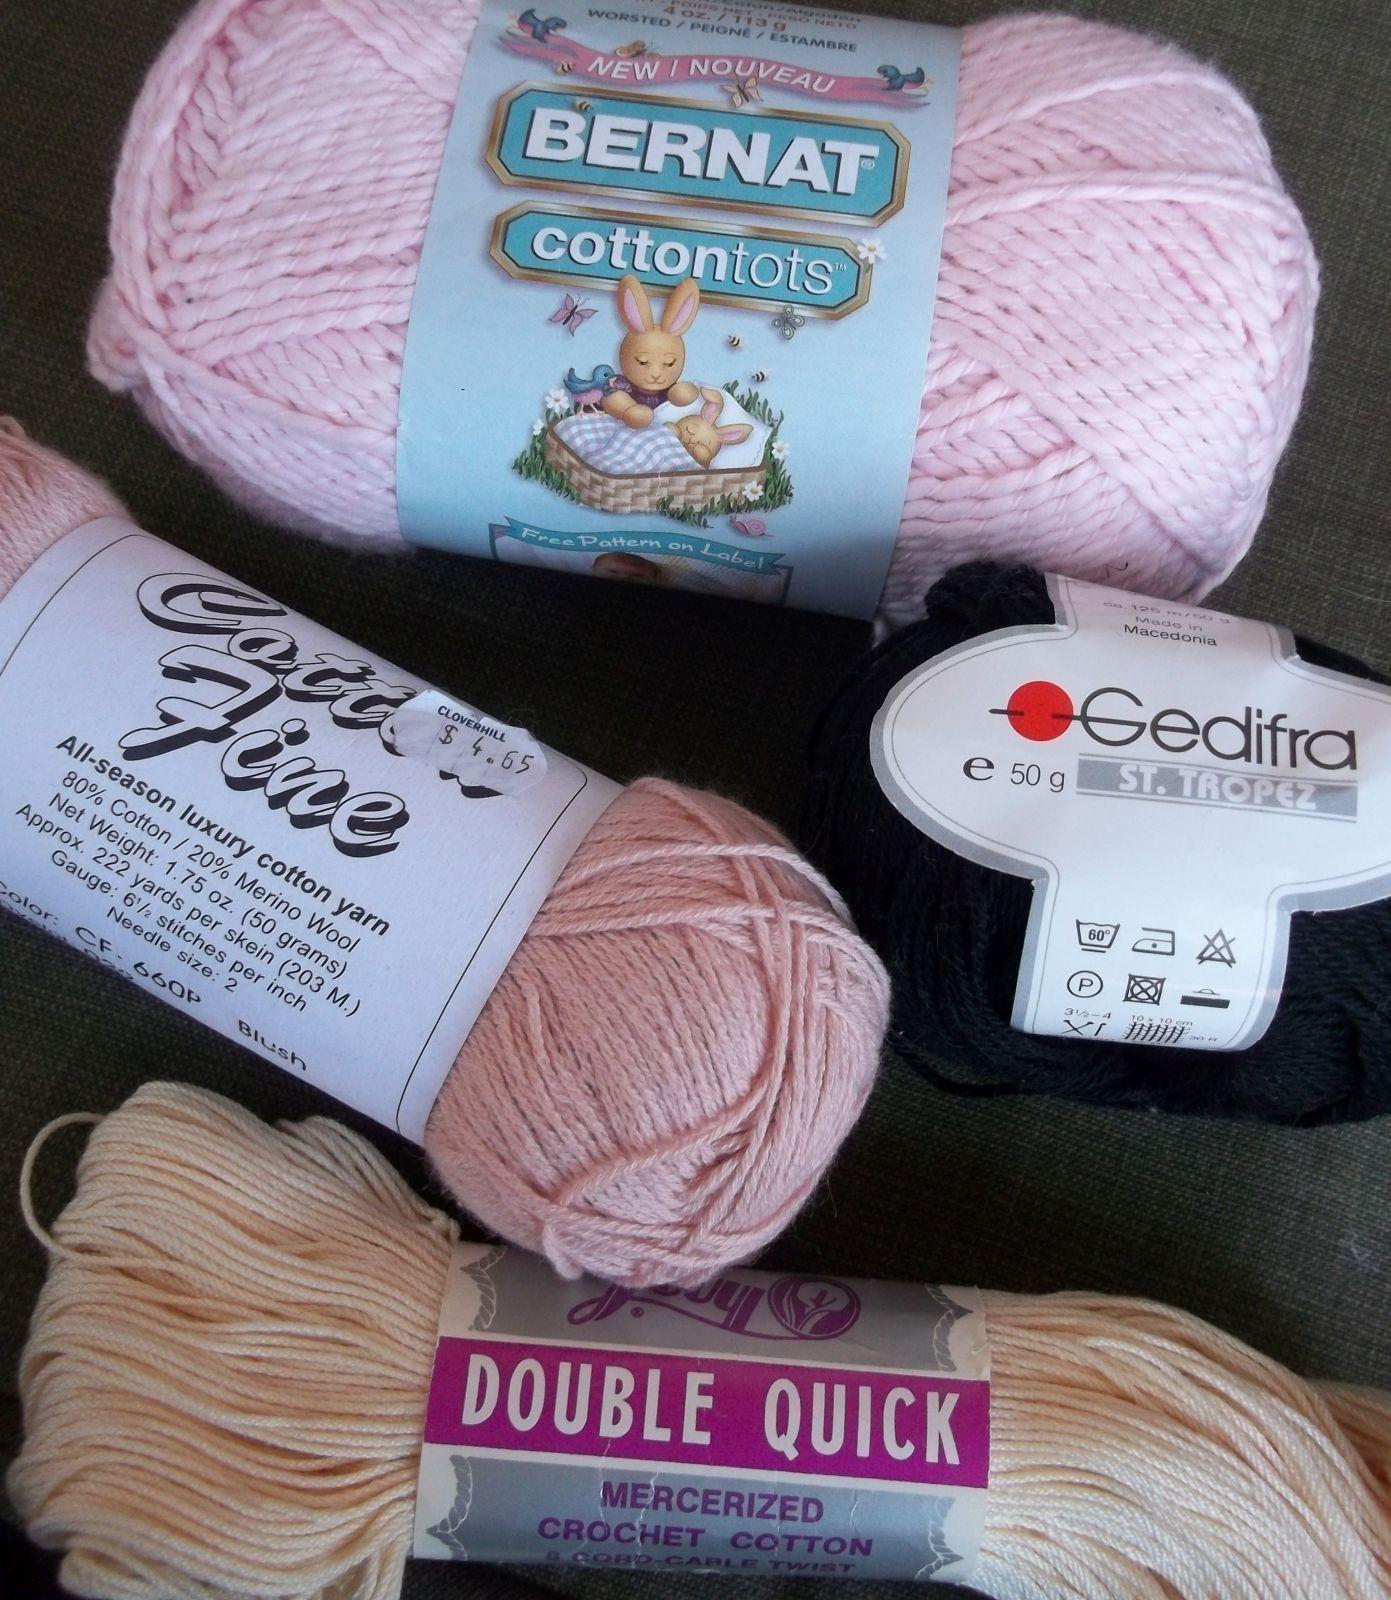 Cotton Yarn 6 Skeins Bernat Bimini Gedifra St Tropez Lily